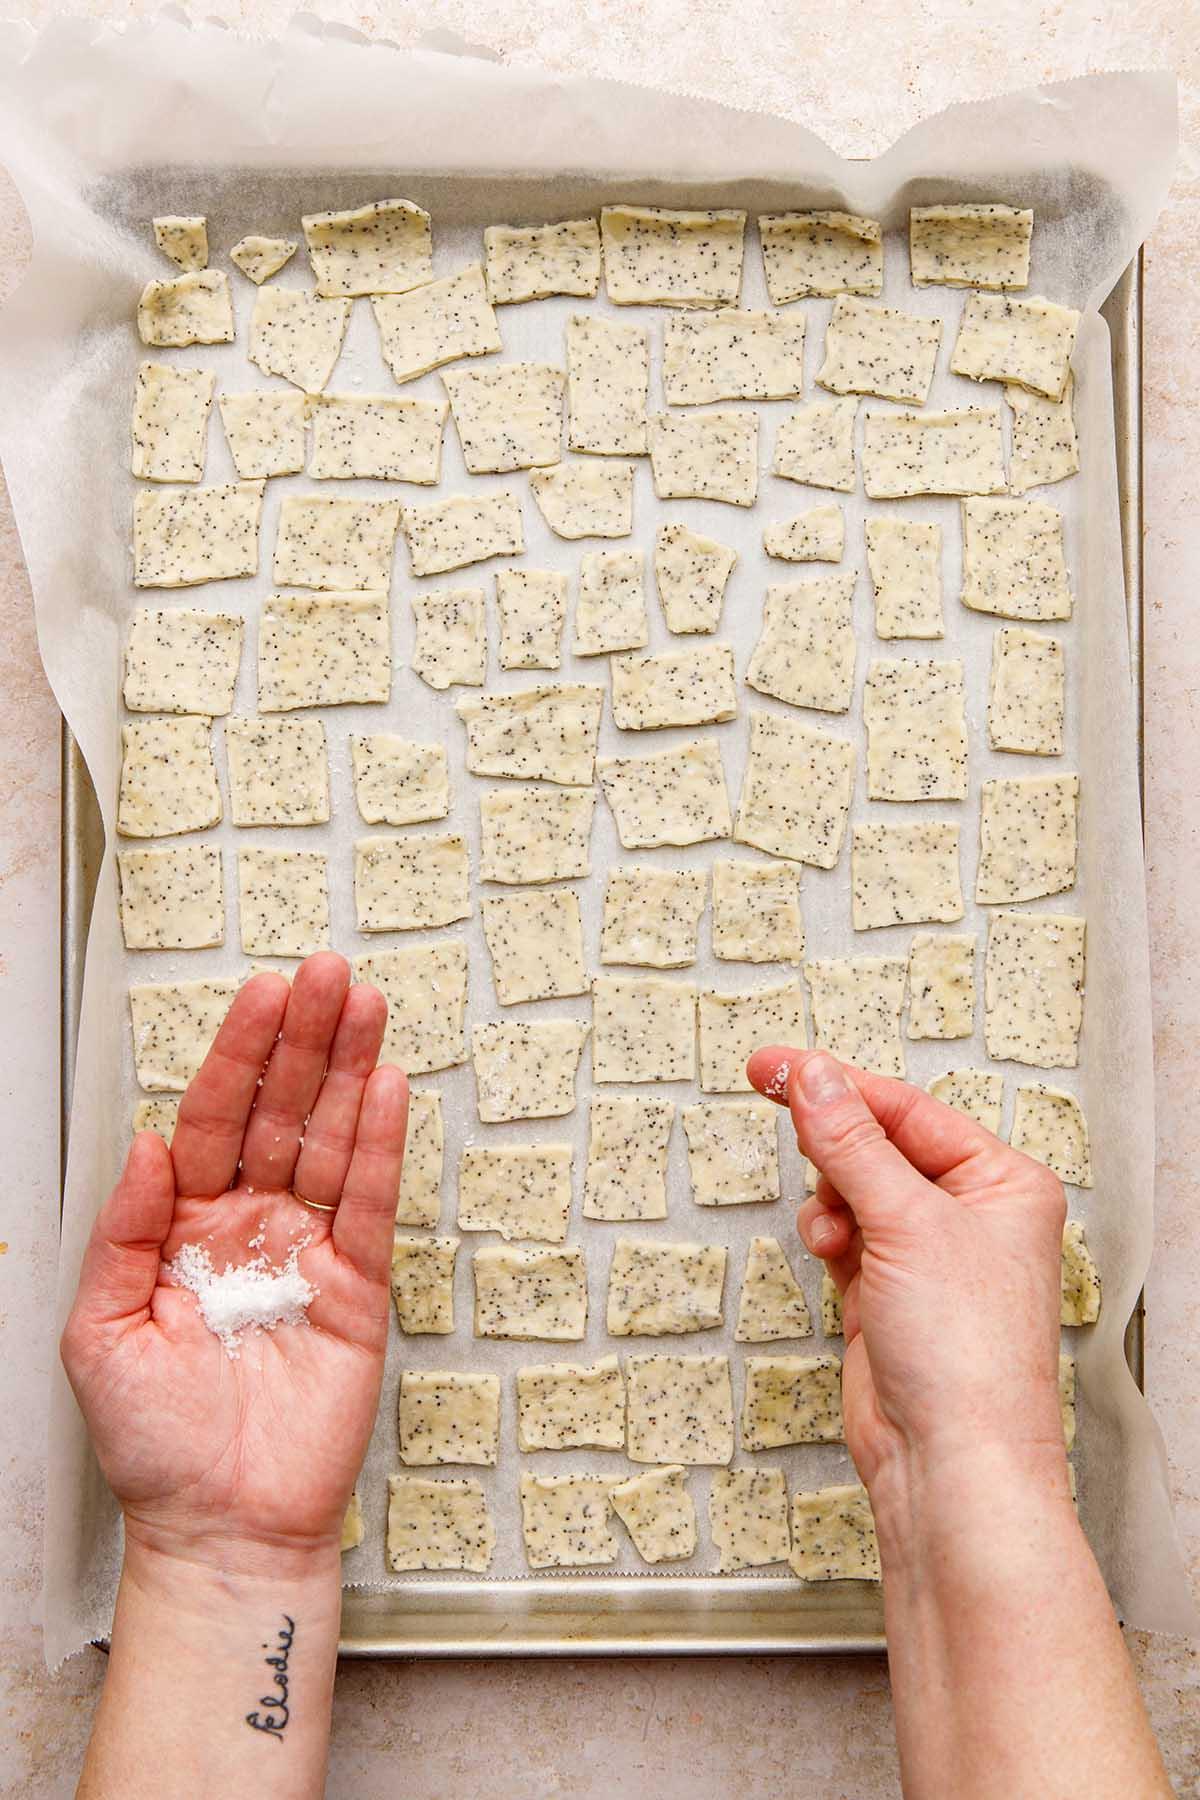 A hand sprinkling salt on unbaked crackers.